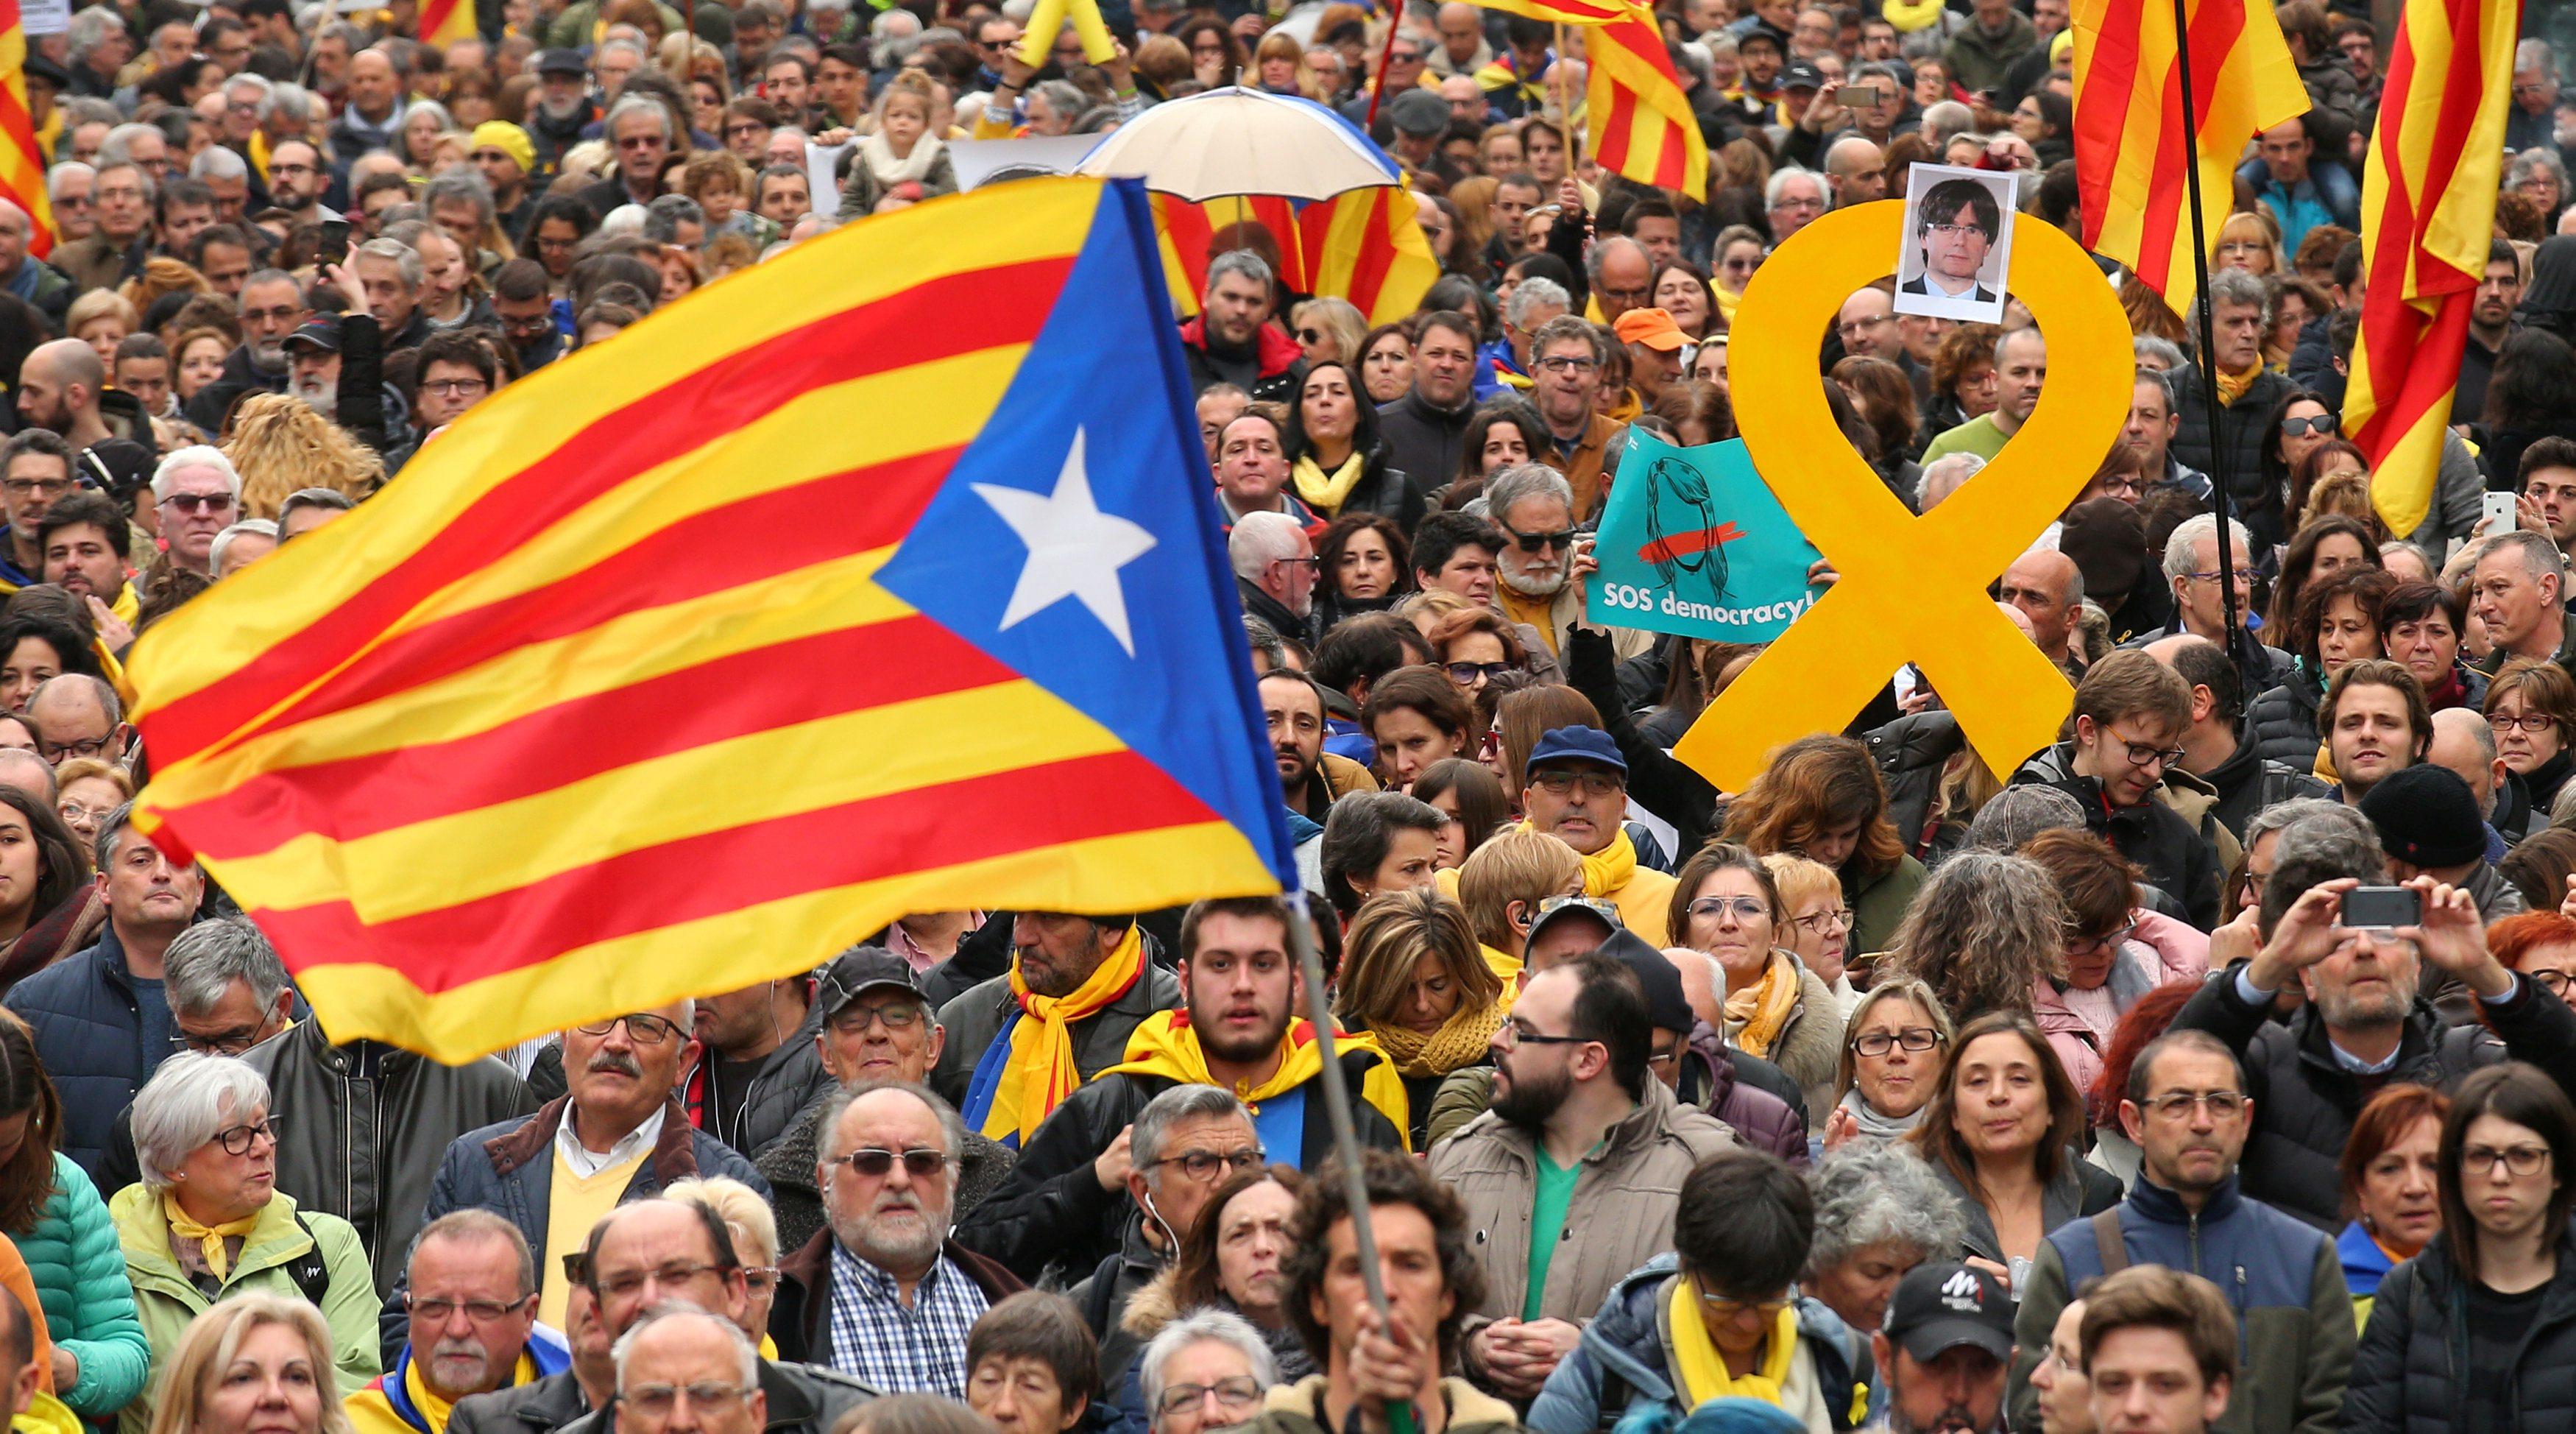 2018-03-25T153628Z_1082676068_RC12F15160A0_RTRMADP_3_SPAIN-POLITICS-CATALONIA-PUIGDEMONT